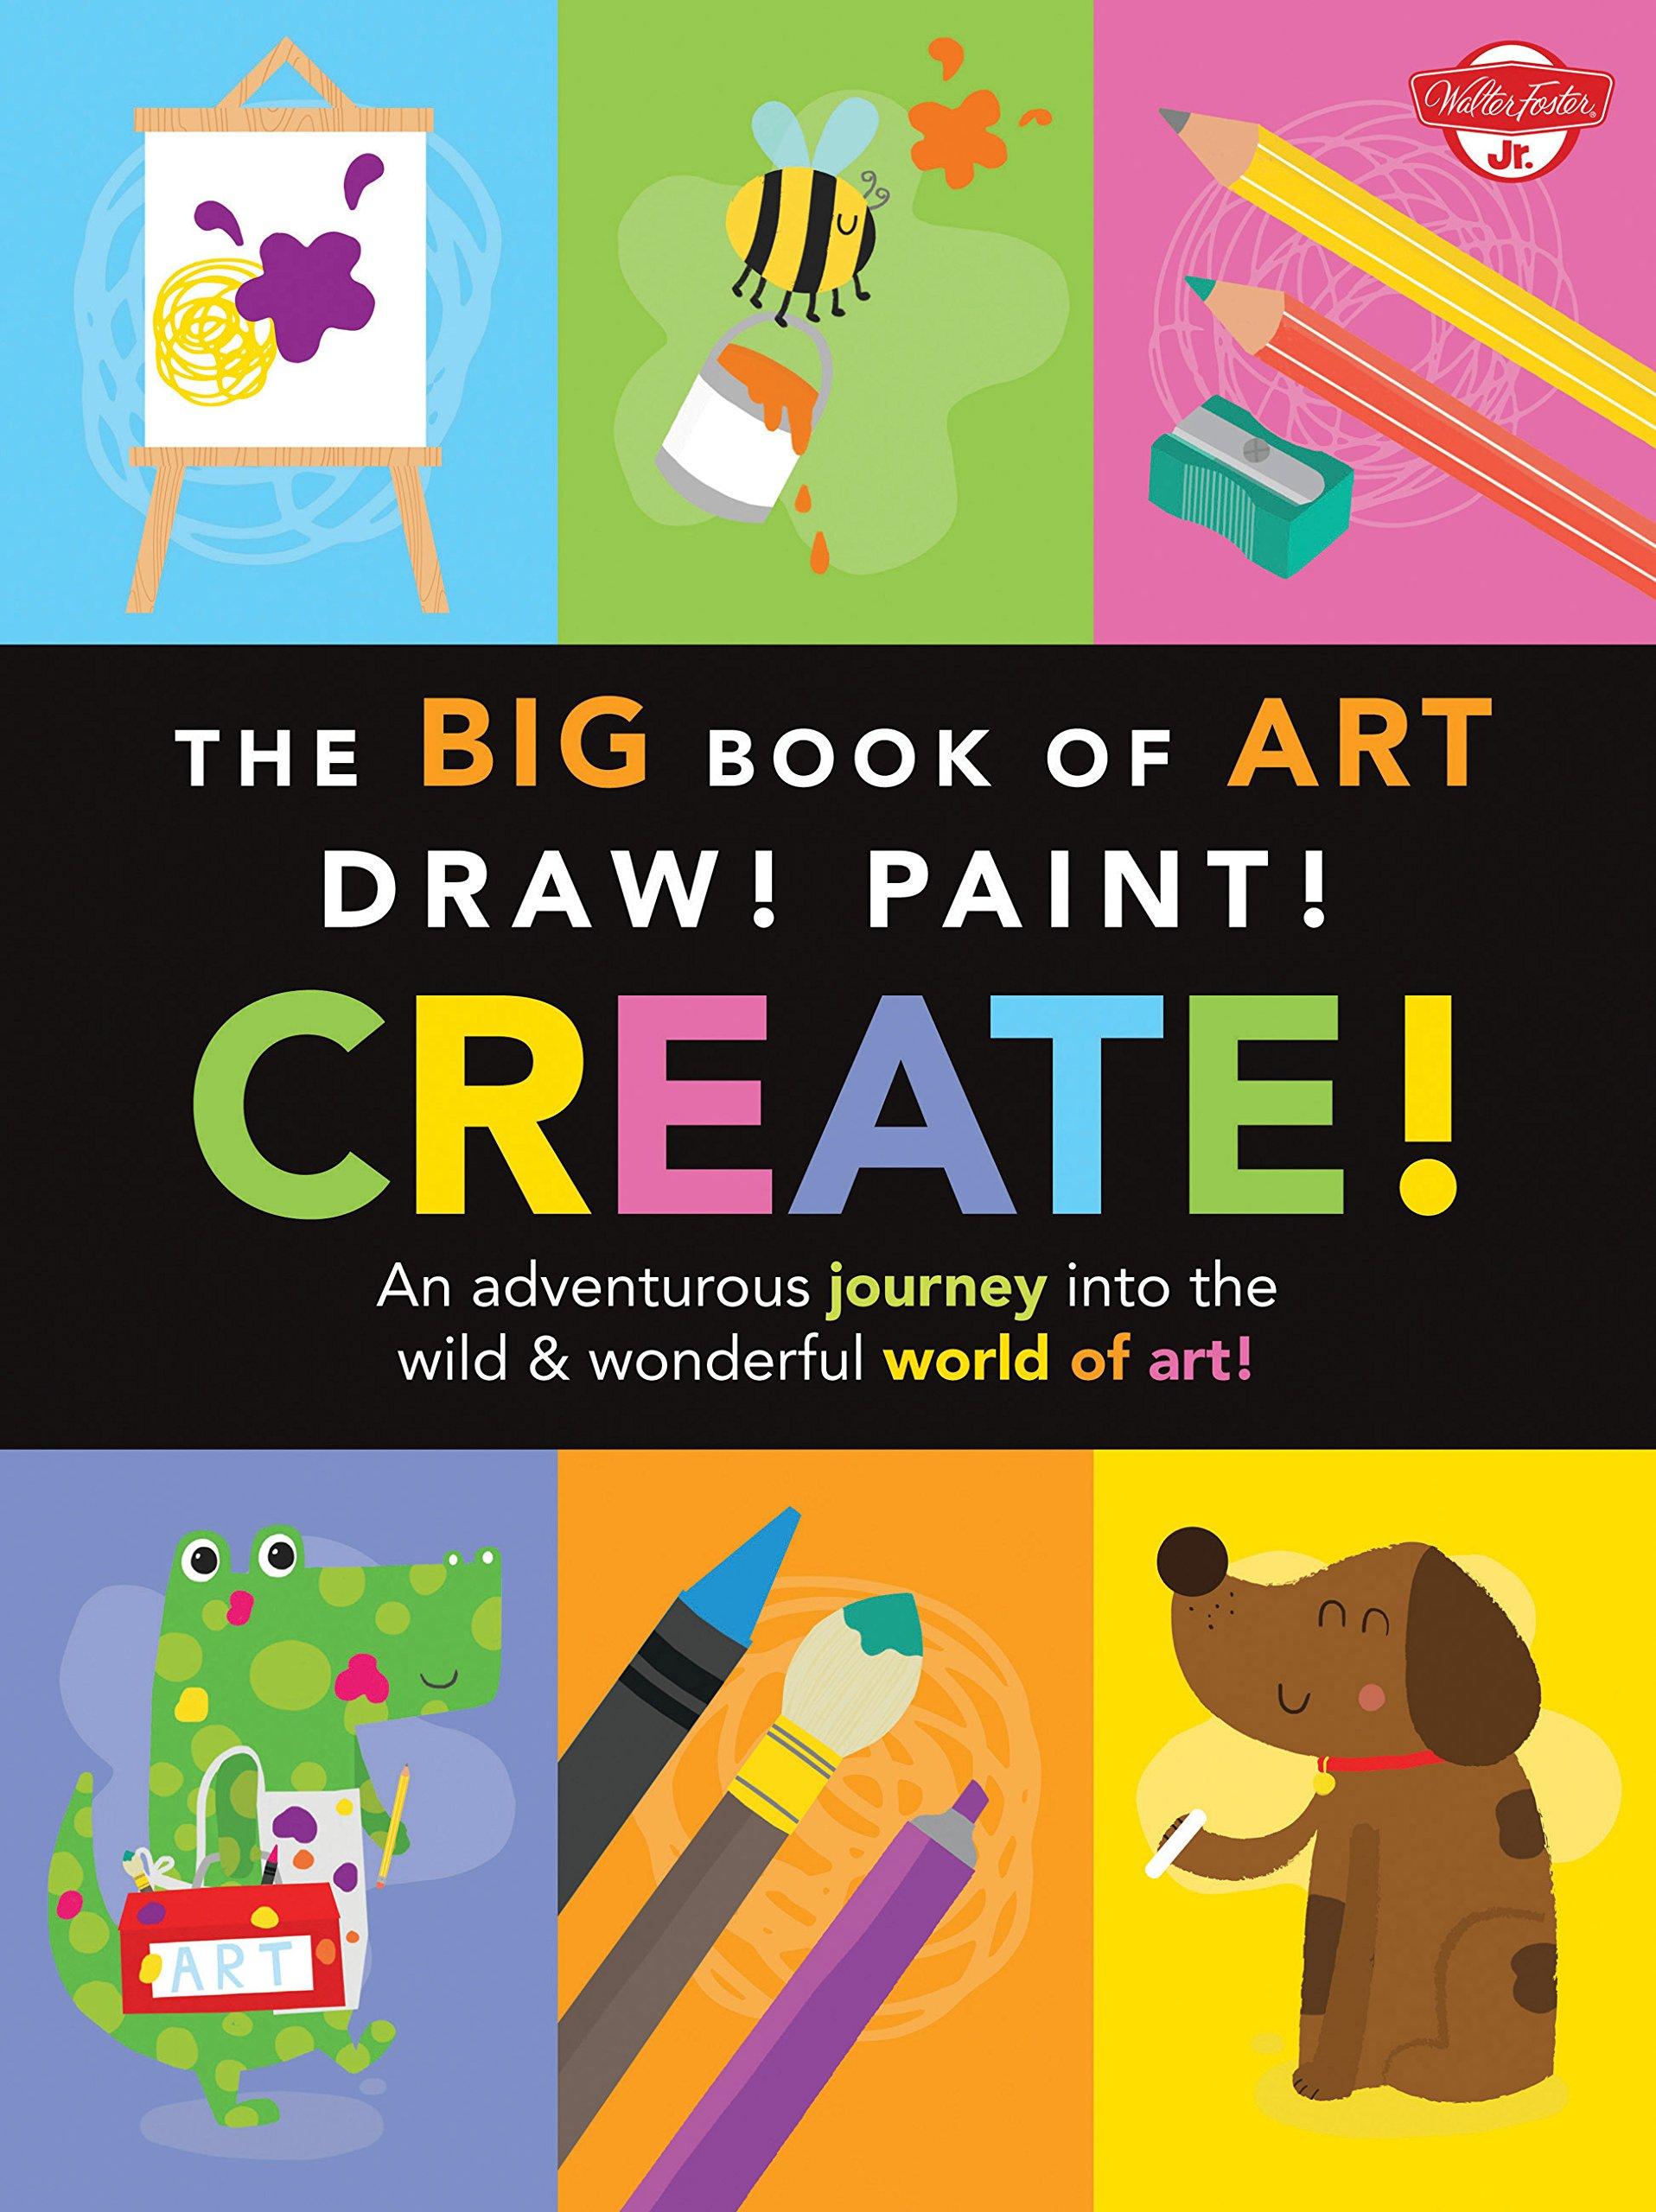 The Big Book of Art: Draw! Paint! Create!: An adventurous journey into the wild & wonderful world of art! (Big Book Series) pdf epub